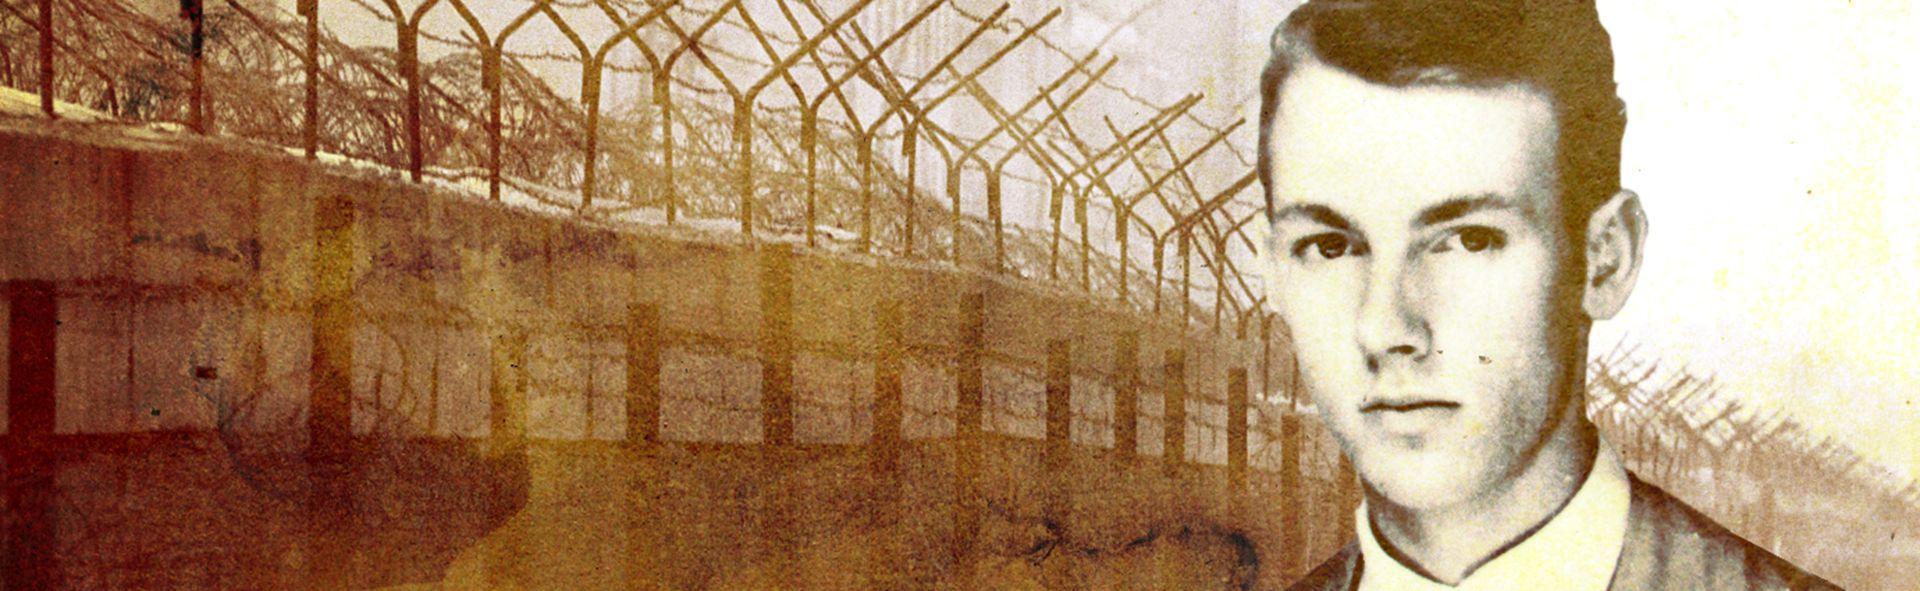 El primer mártir del Muro de Berlín